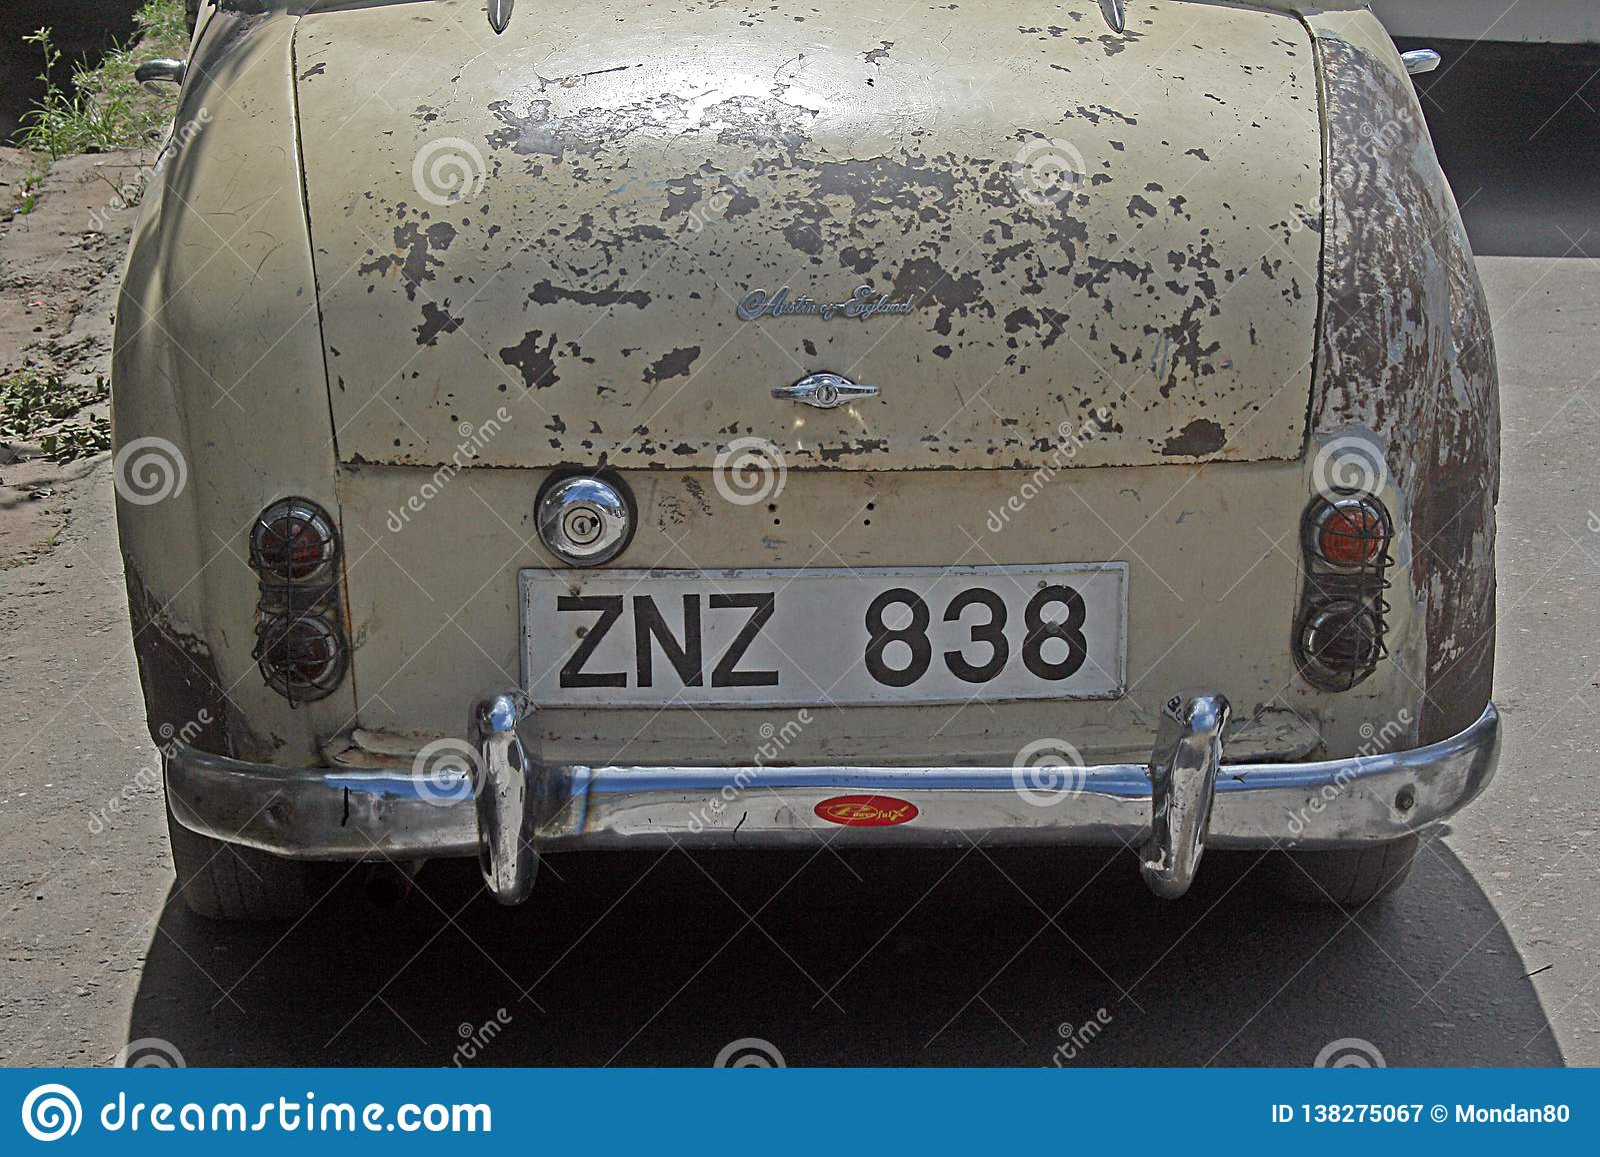 Zanzibar license plate editorial photography  Image of